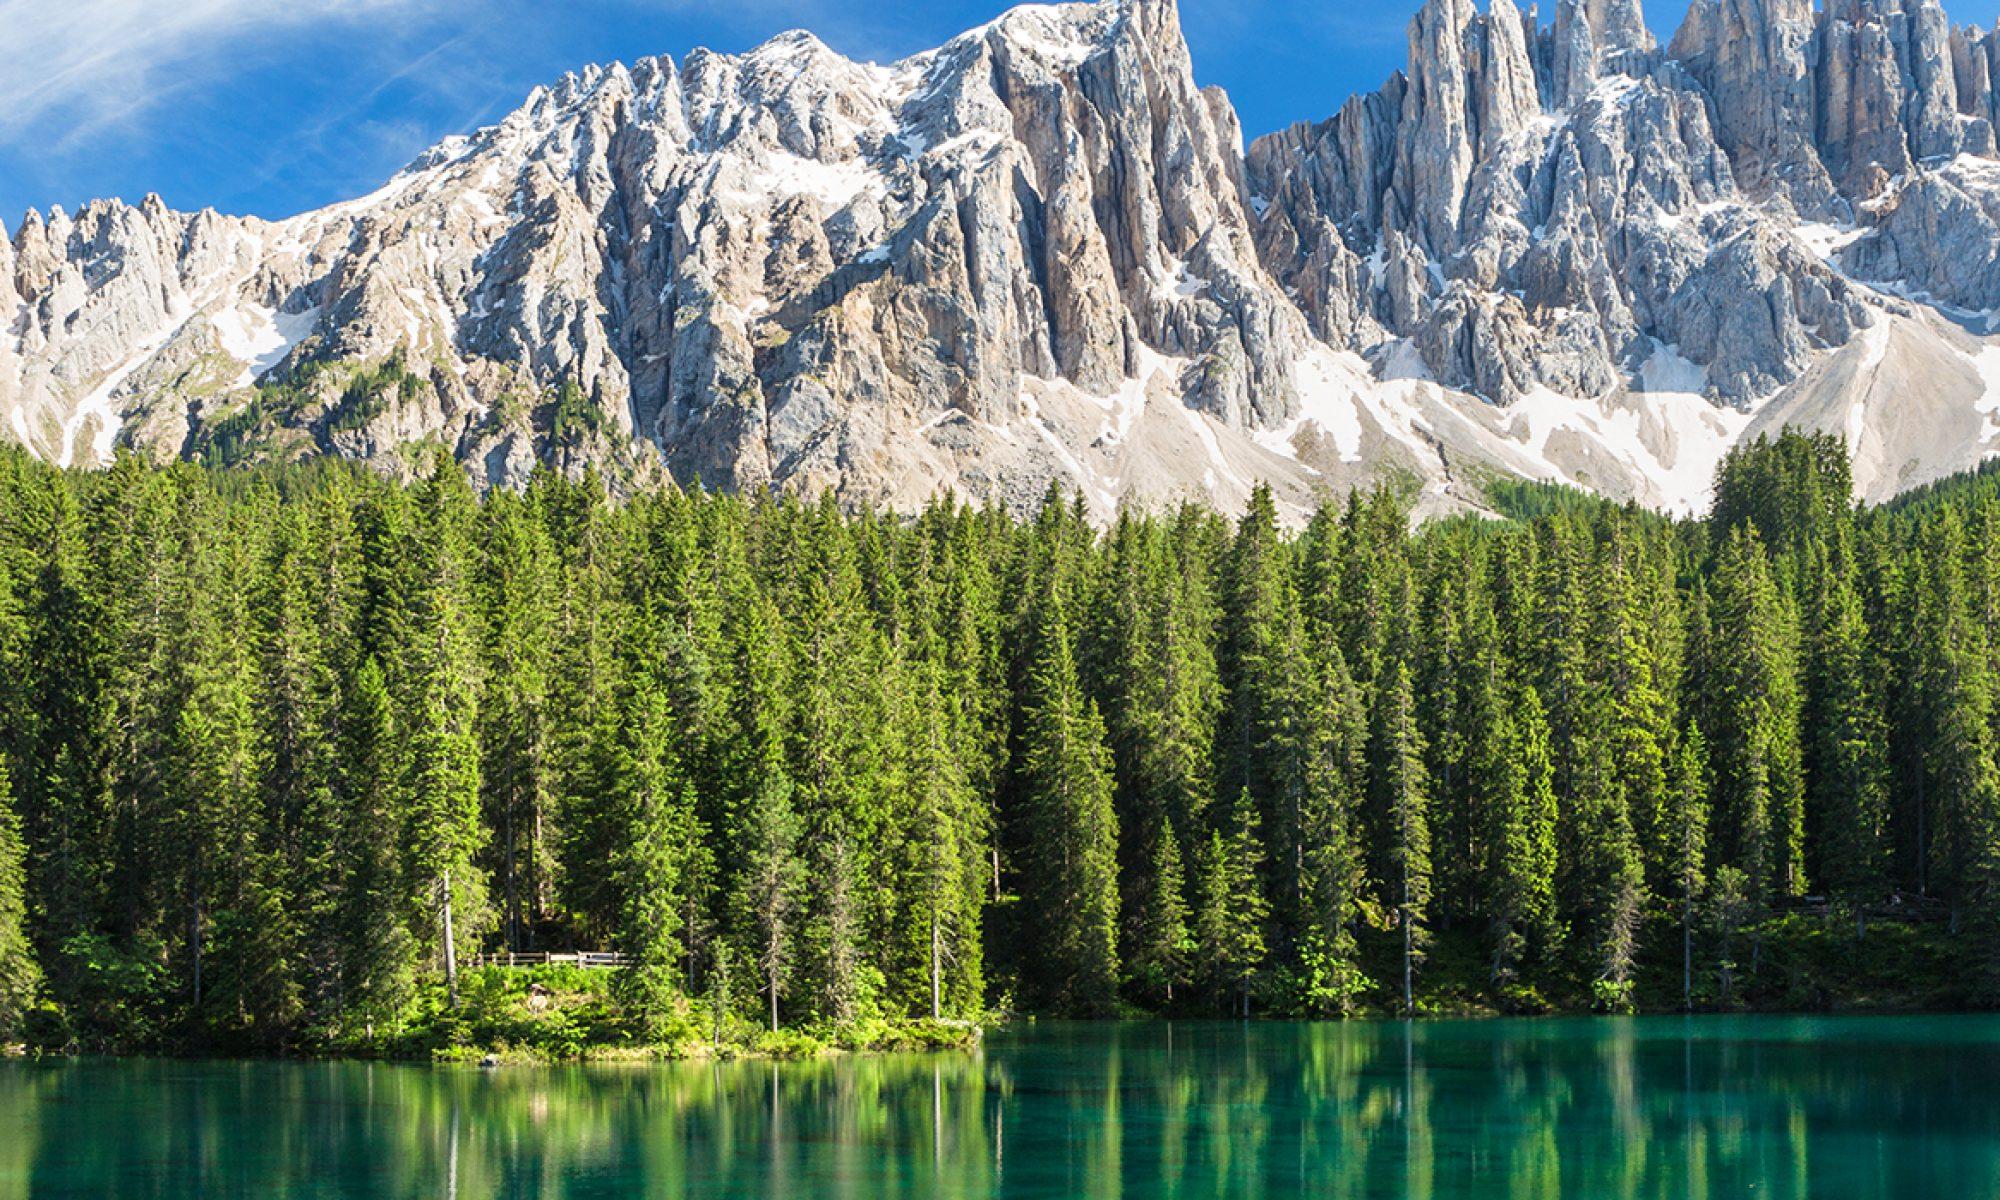 BOSK 2020 - The Bolzano Summer of Knowledge